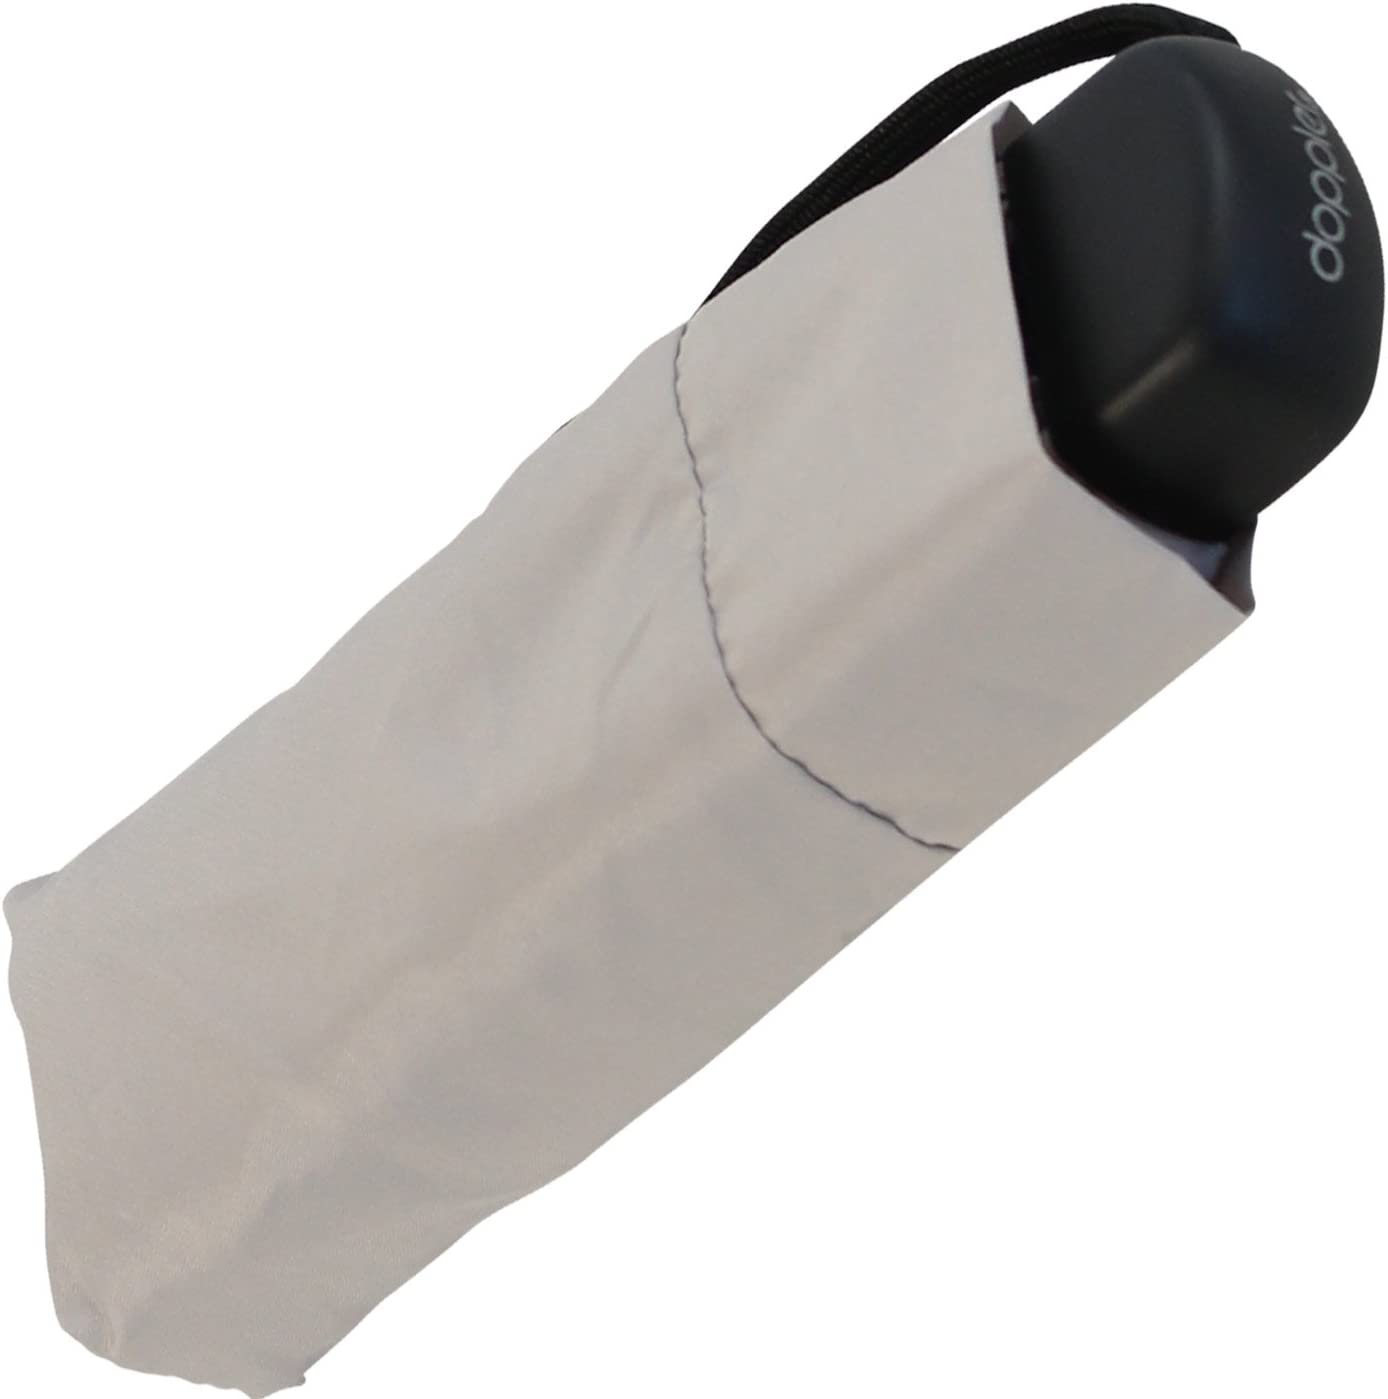 Paraguas para teléfono móvil, tamaño mini, color gris